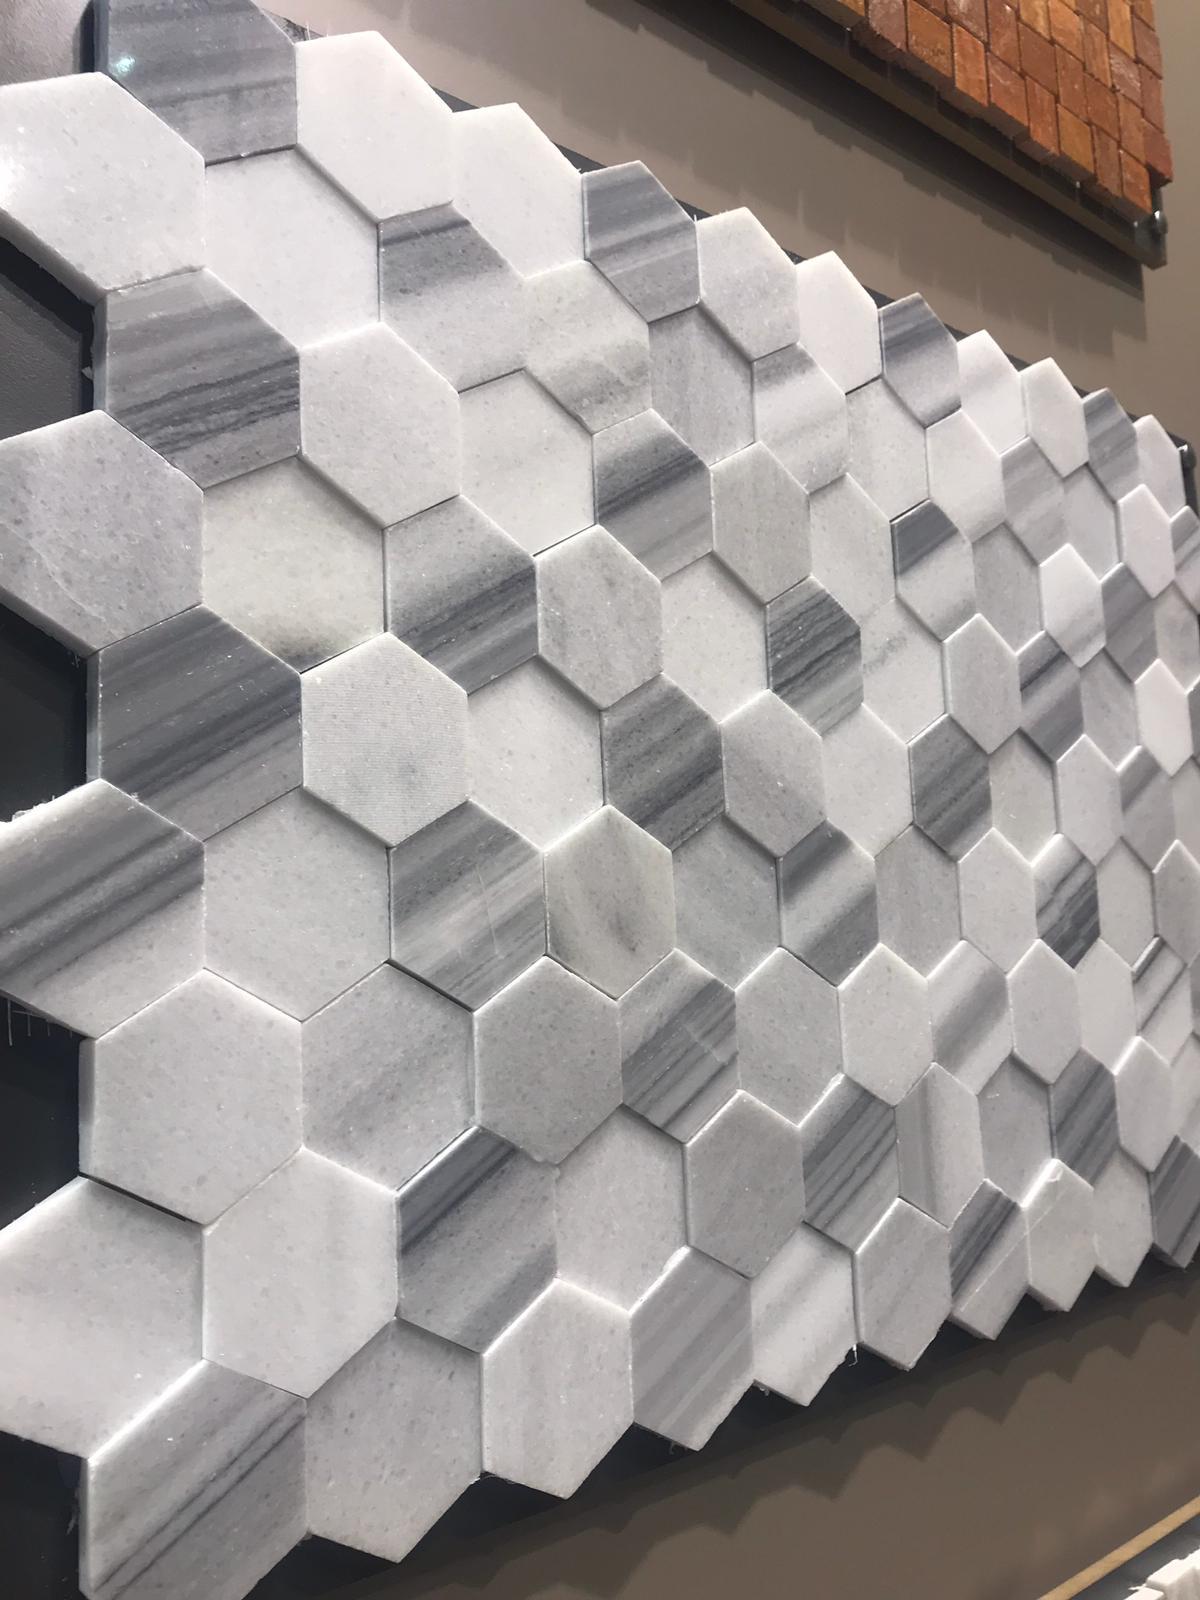 3D Tiles Collection